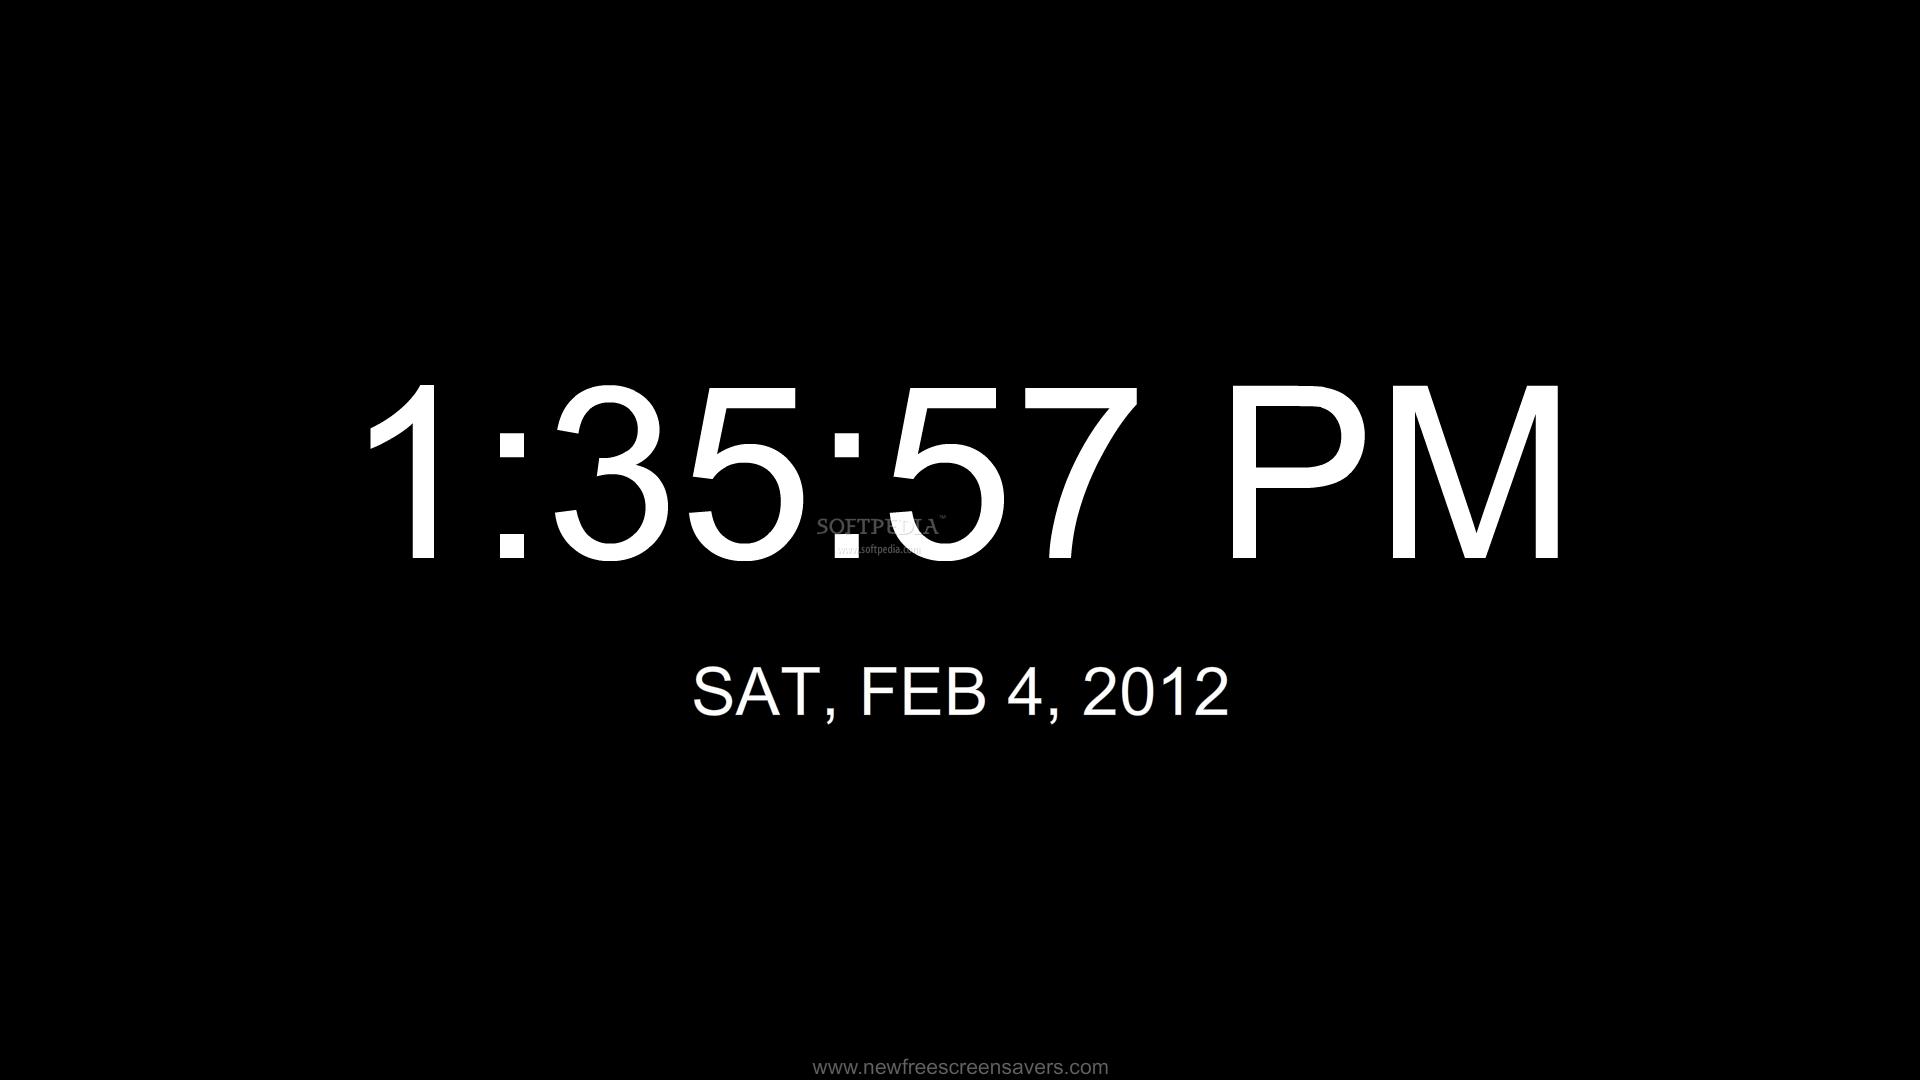 numbers from a portable digital trustedsep clock a digital clockid